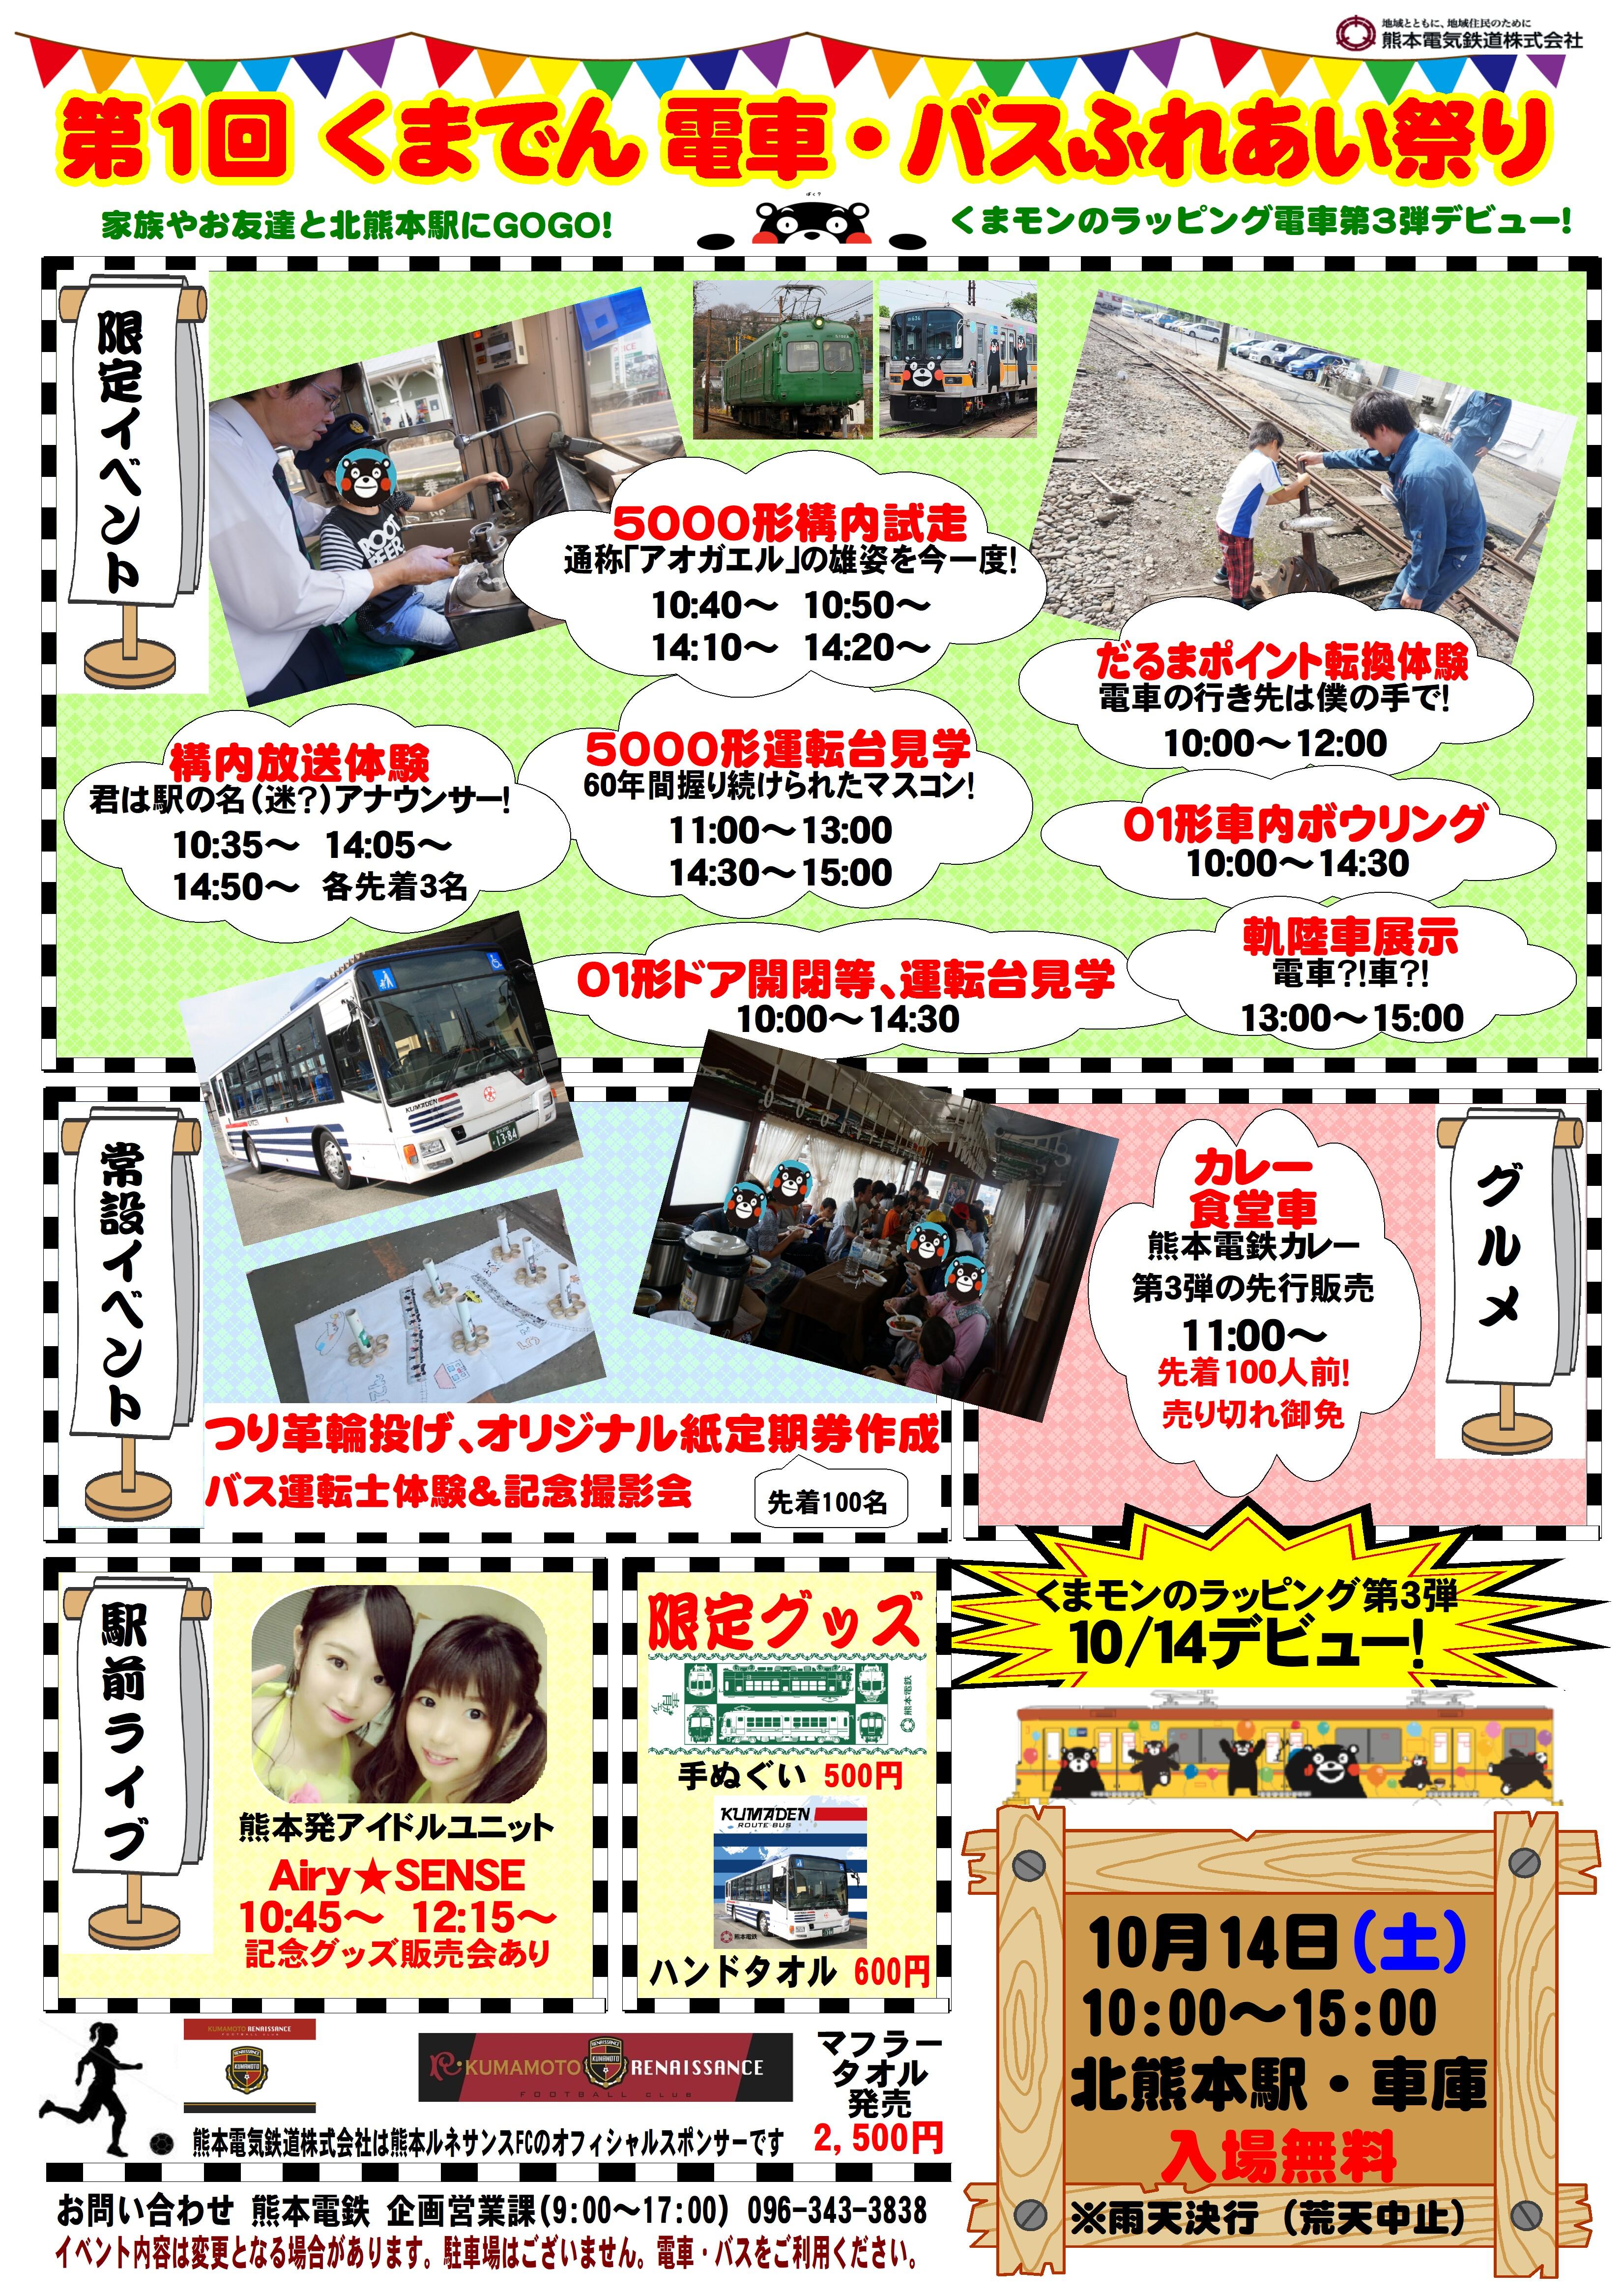 fureaimatsuri2017.jpg